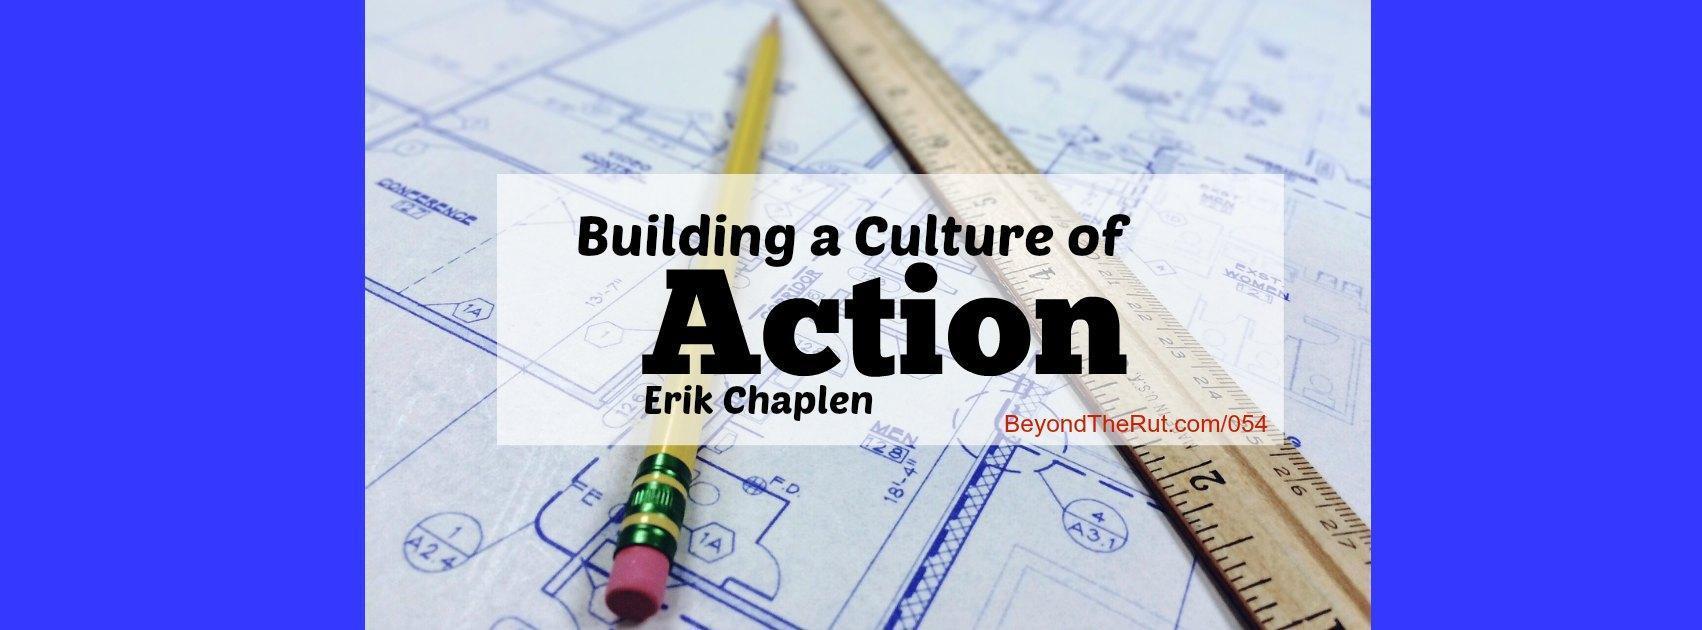 BtR 054 Culture of Action Erik Chaplen